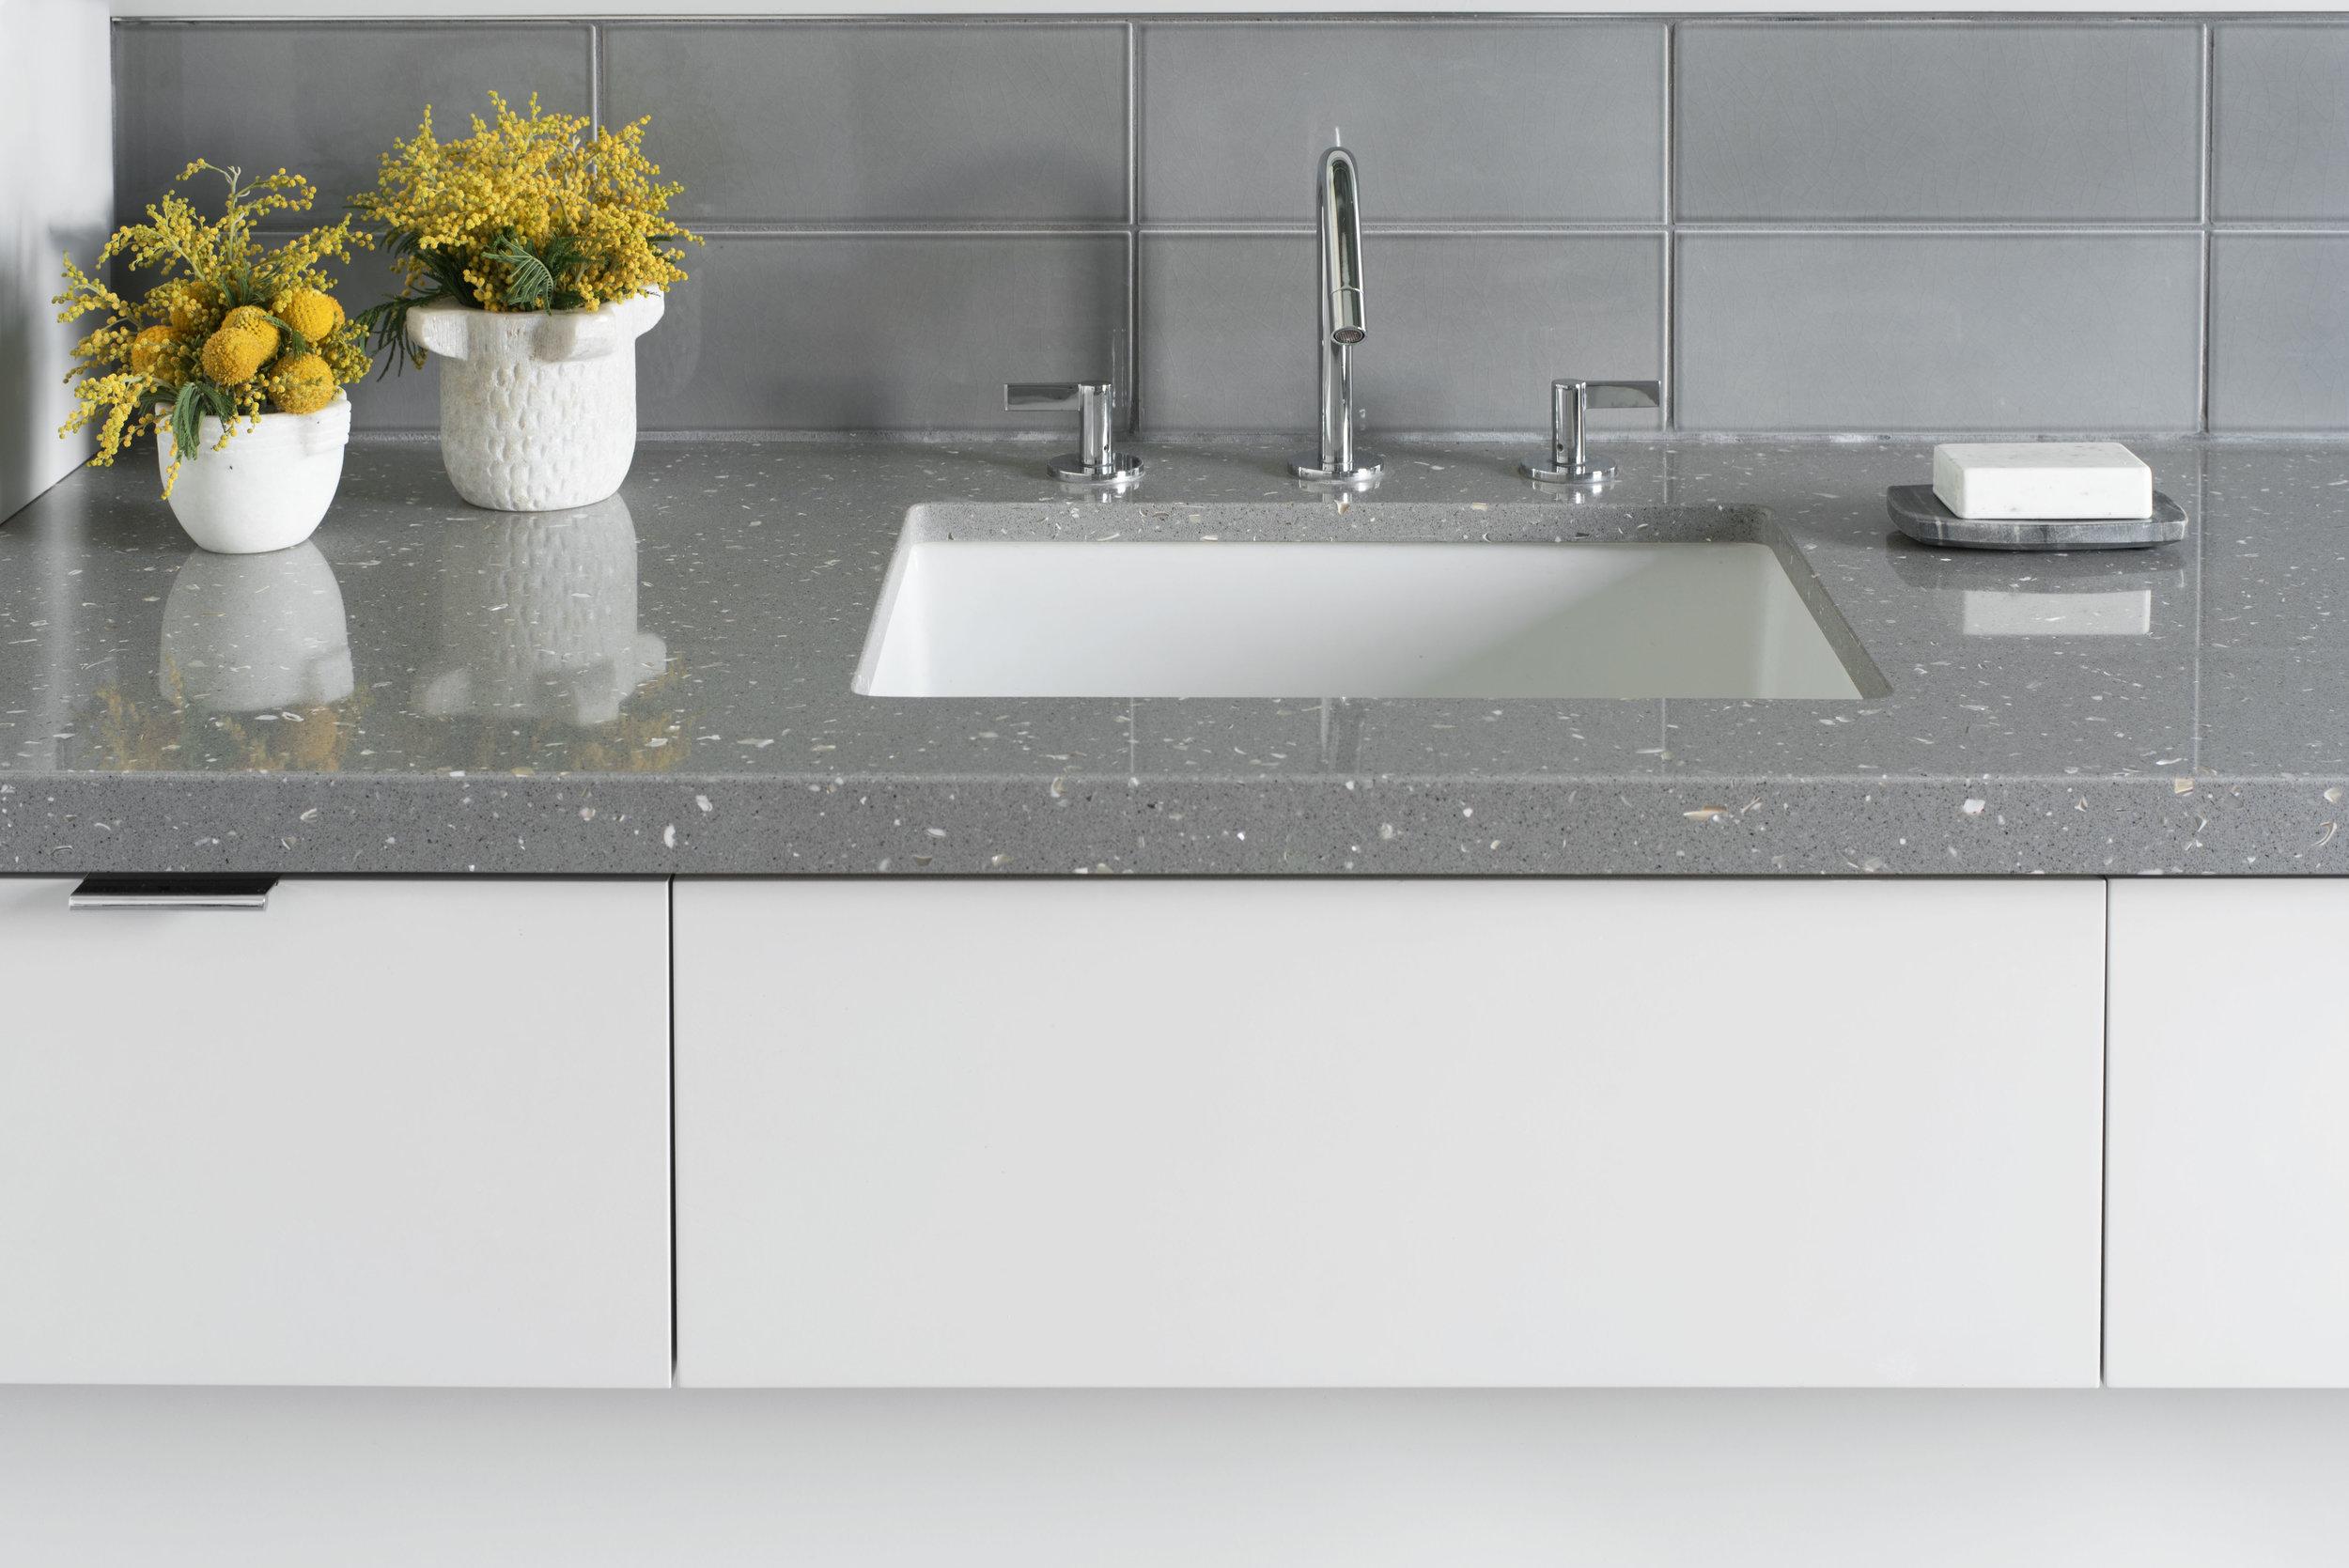 sarah-barnard-design-luxury-minimalism-santa-monica-vanity.jpg